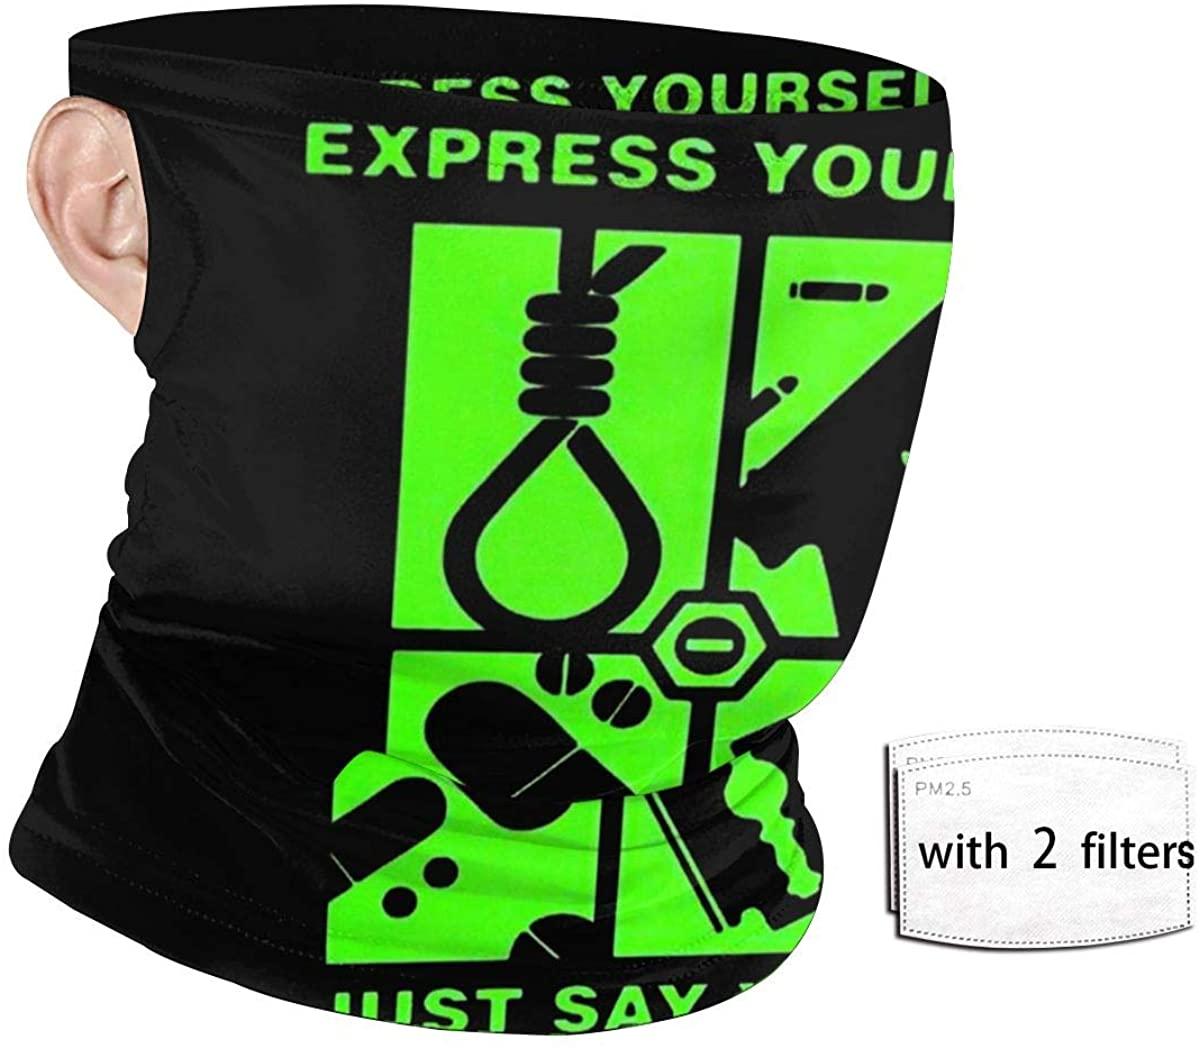 Halasa Unisex Ear-Type Face Bandana Type O Negative Express Yourself Face Mask Reusable With Filter